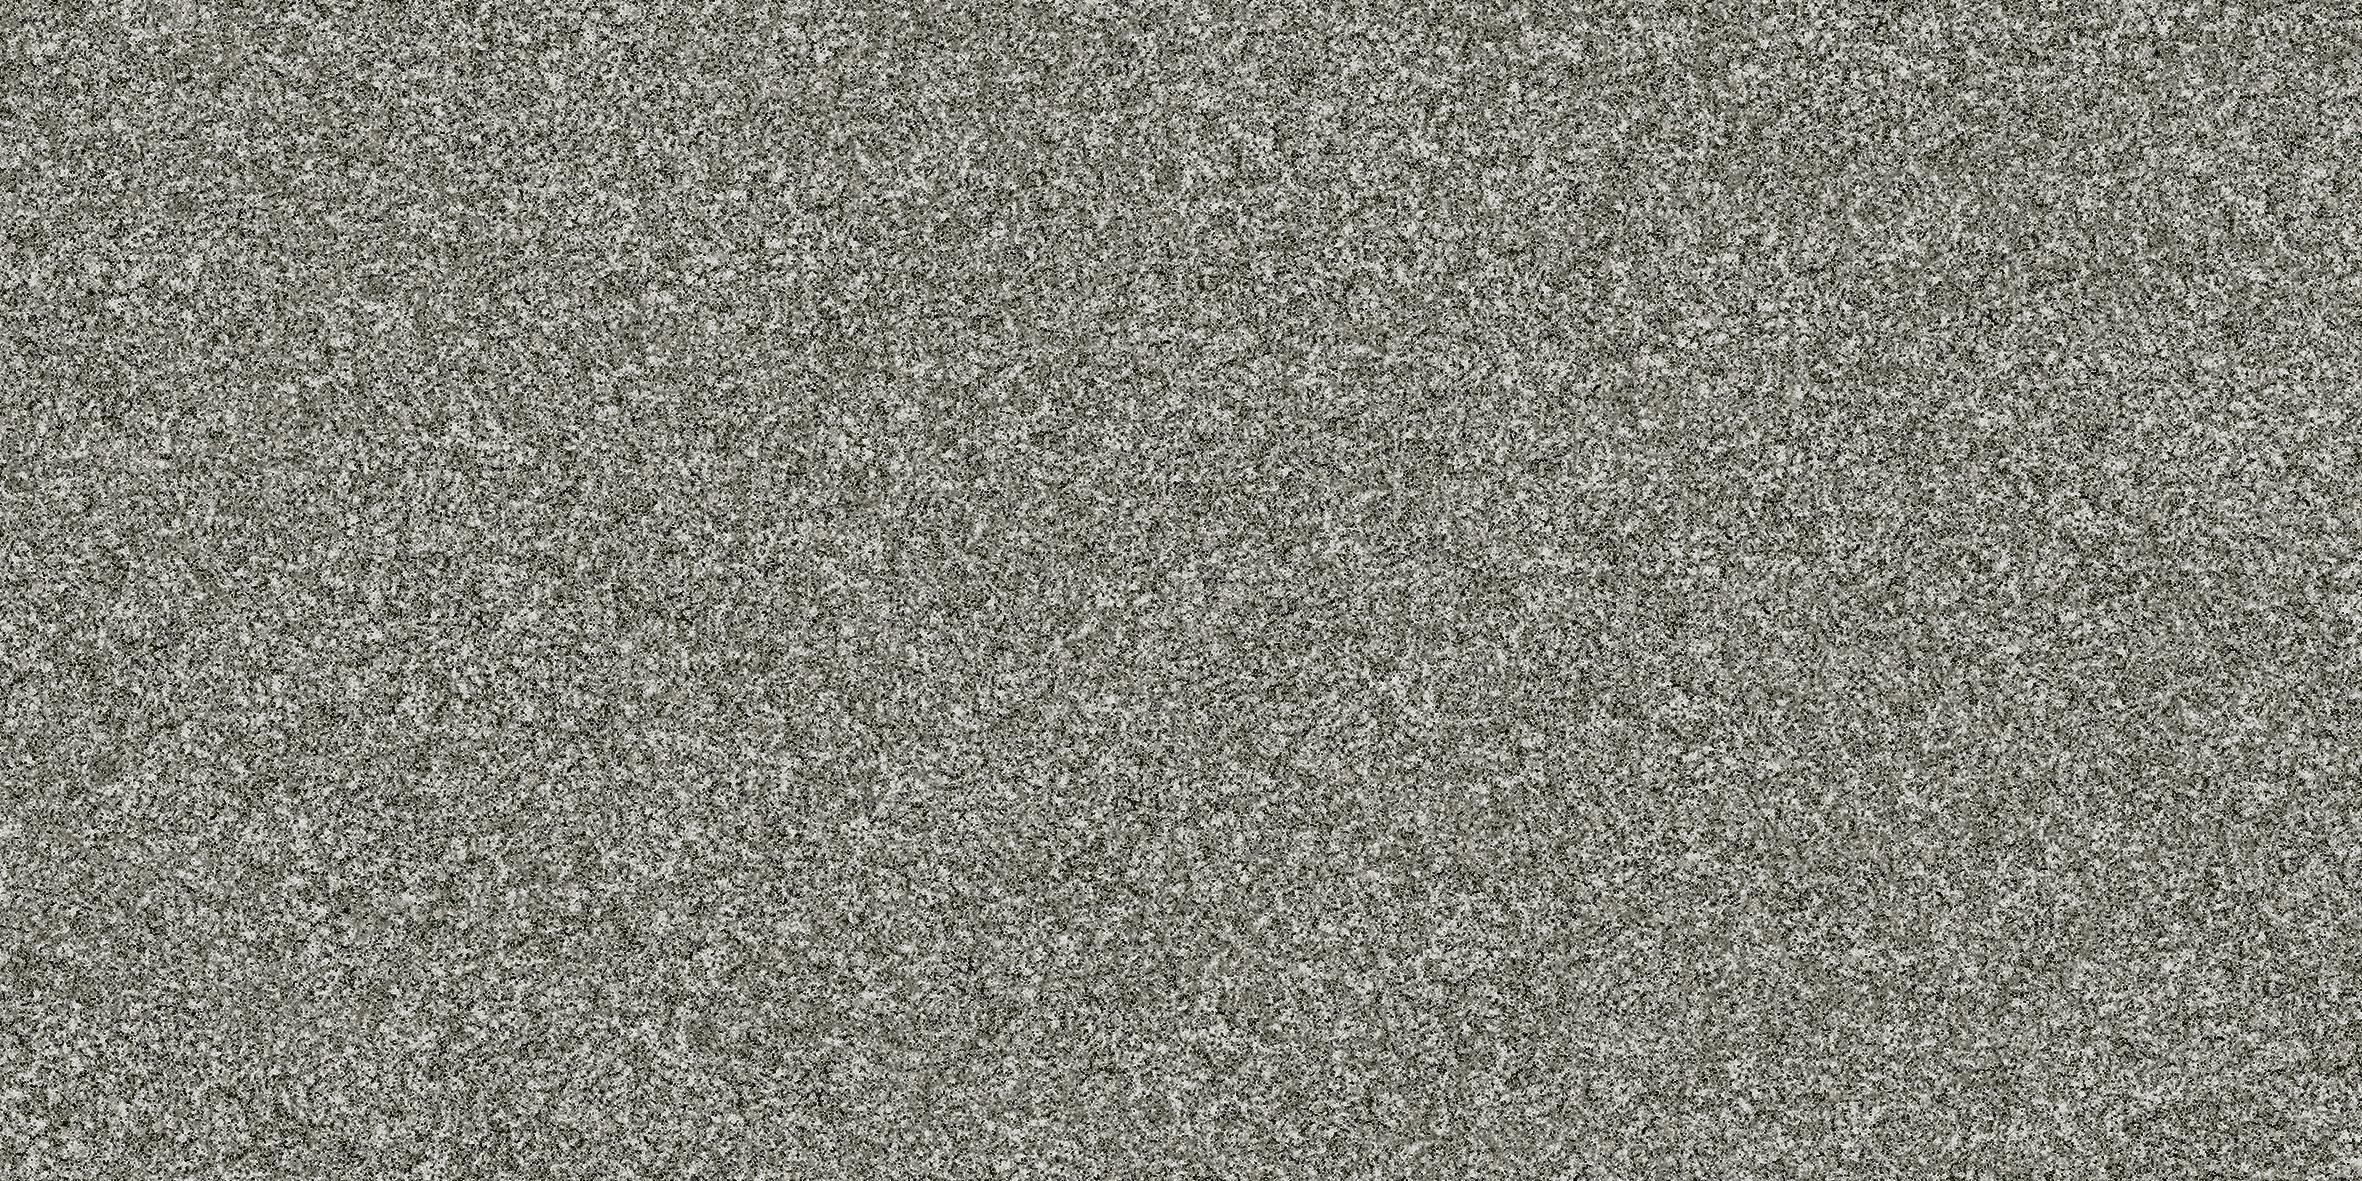 36HG02A芝麻深灰